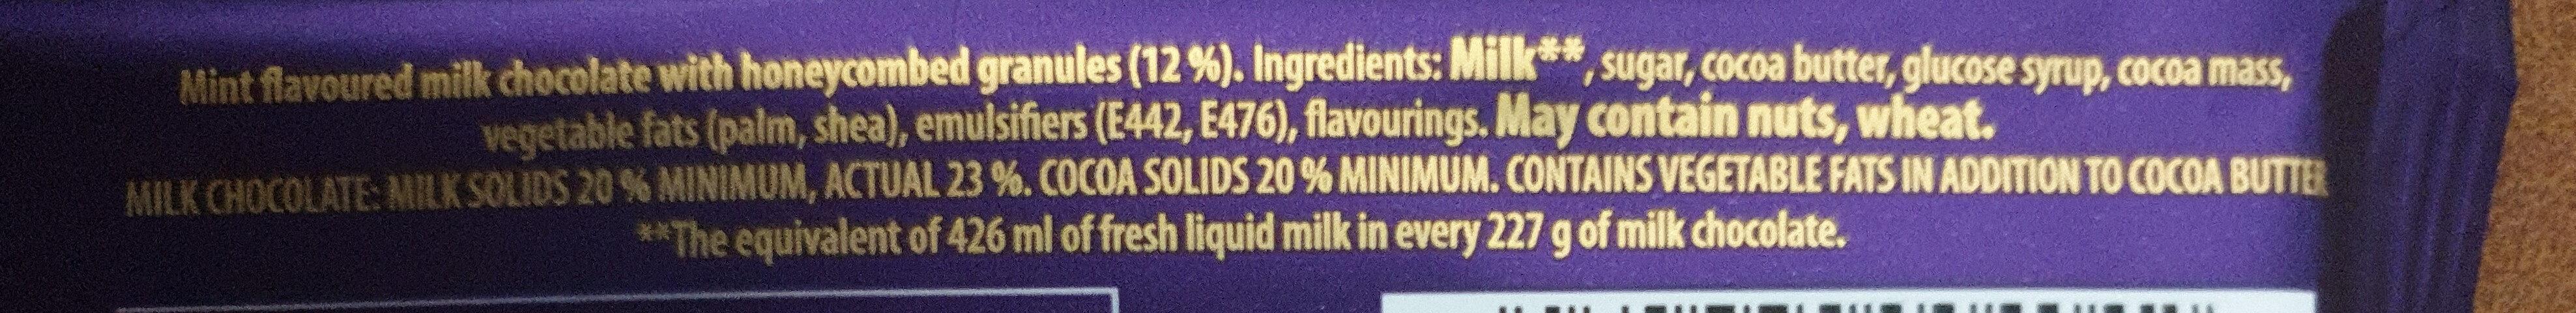 Cadbury dairy milk chocolate bar mint - Ingrédients - en